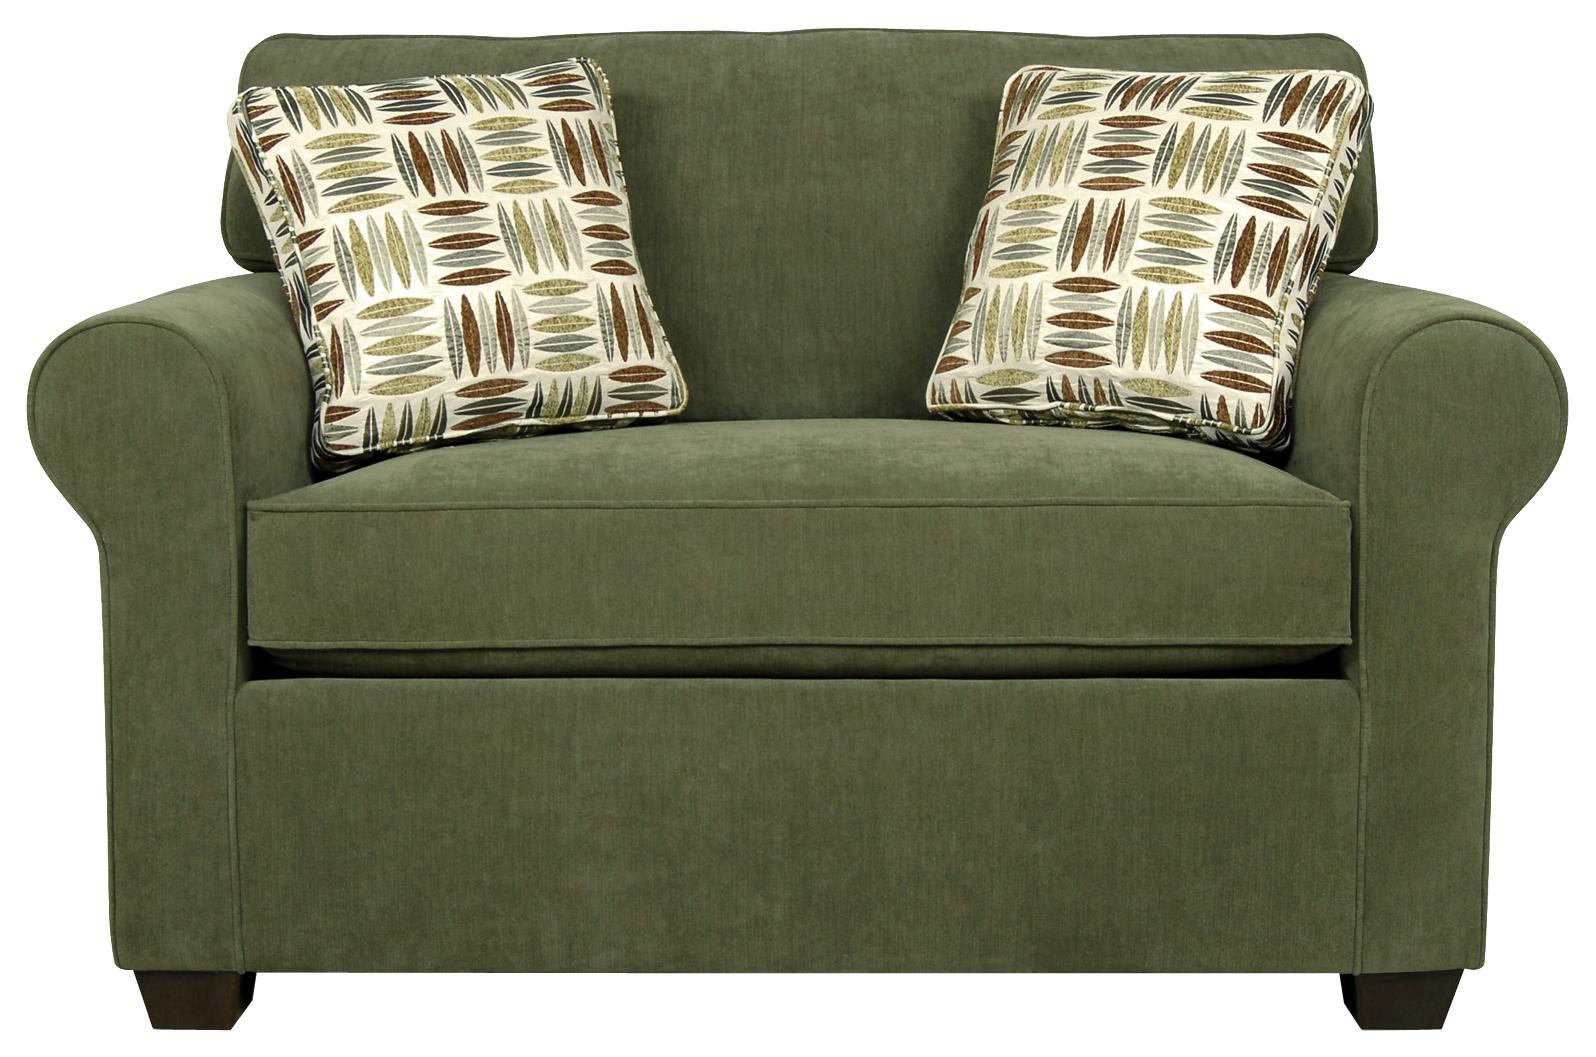 Twin Bed Chair Sleeper Design  HomesFeed